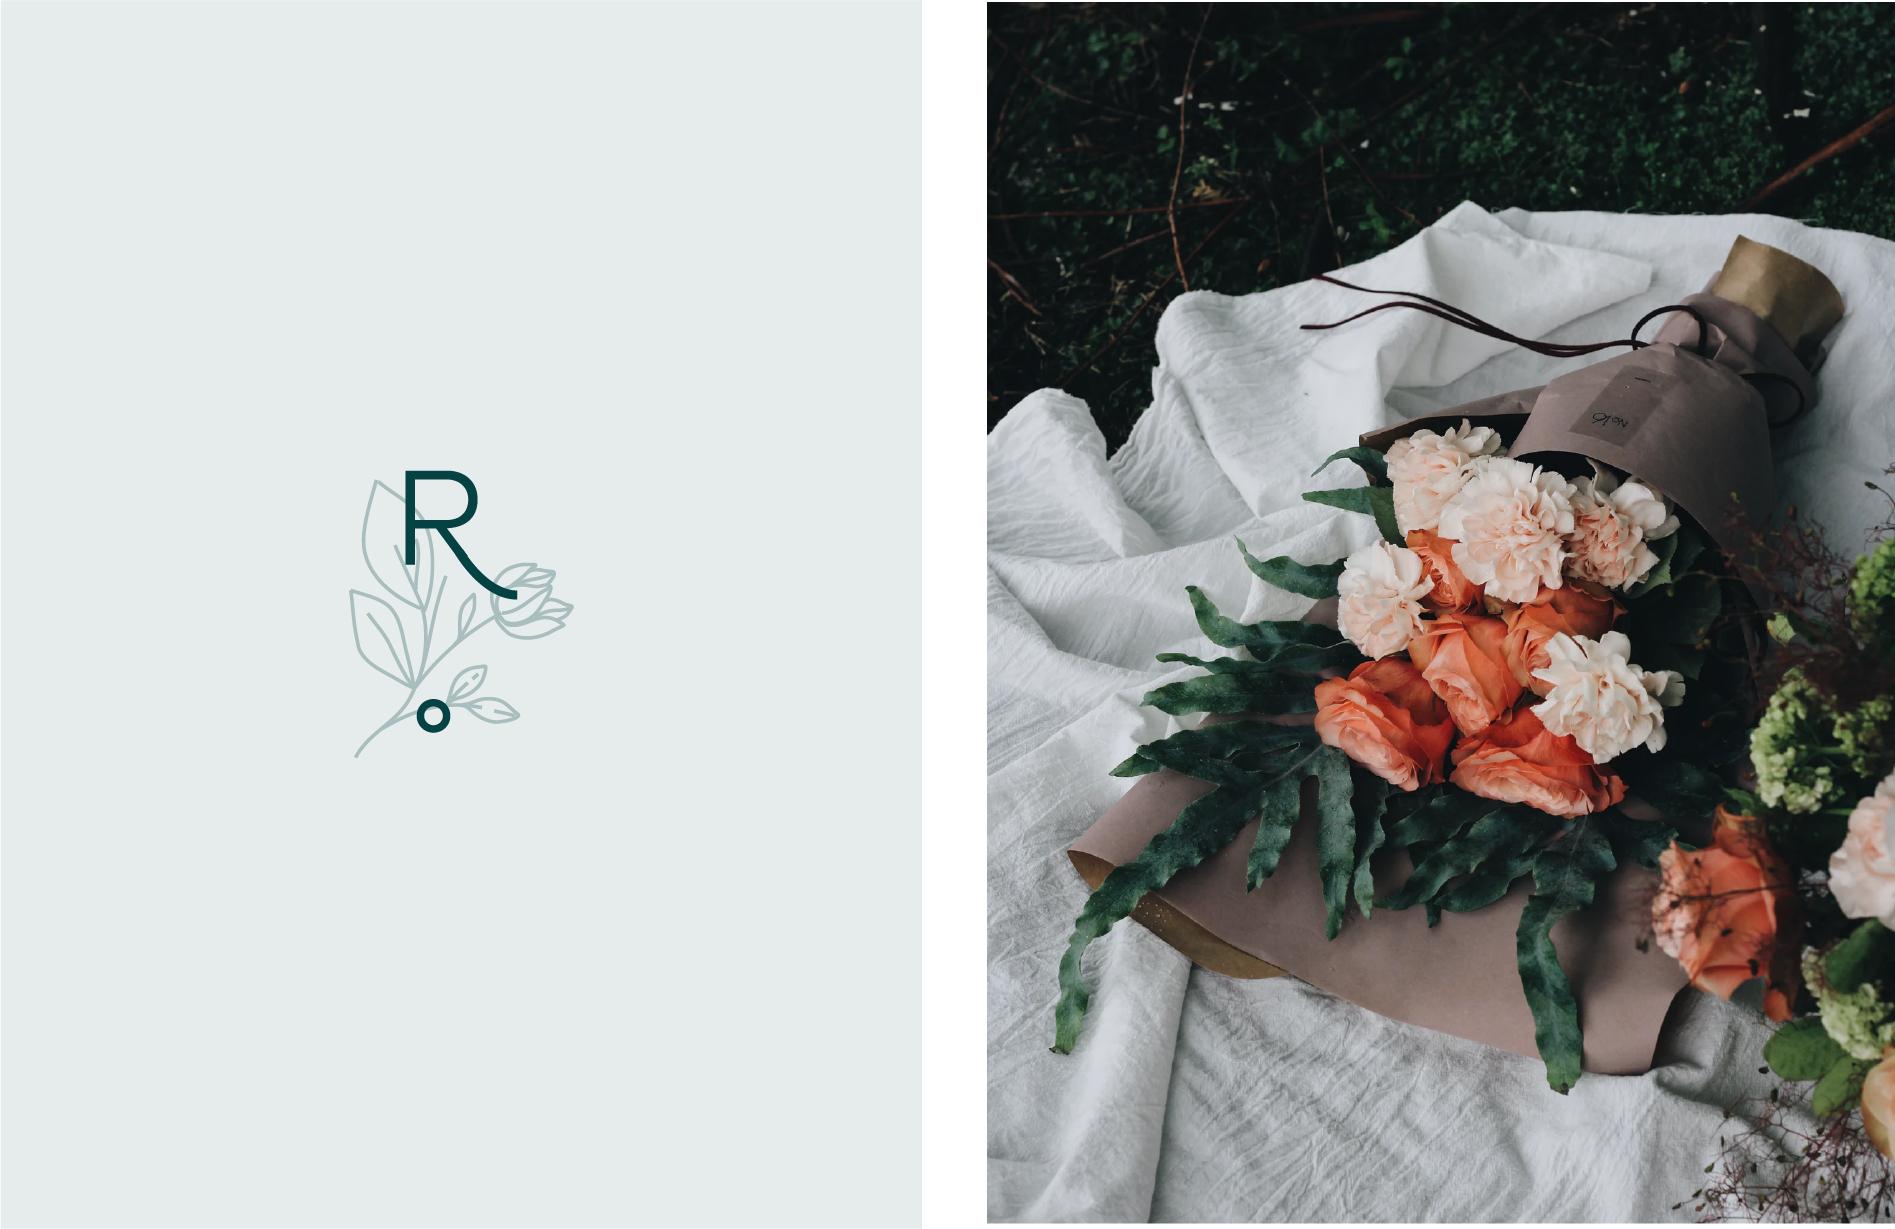 mariebabeau-graphiste-strasbourg-creation-logo-charte-graphique-alsace-ronsard-fleuriste3@2x-100